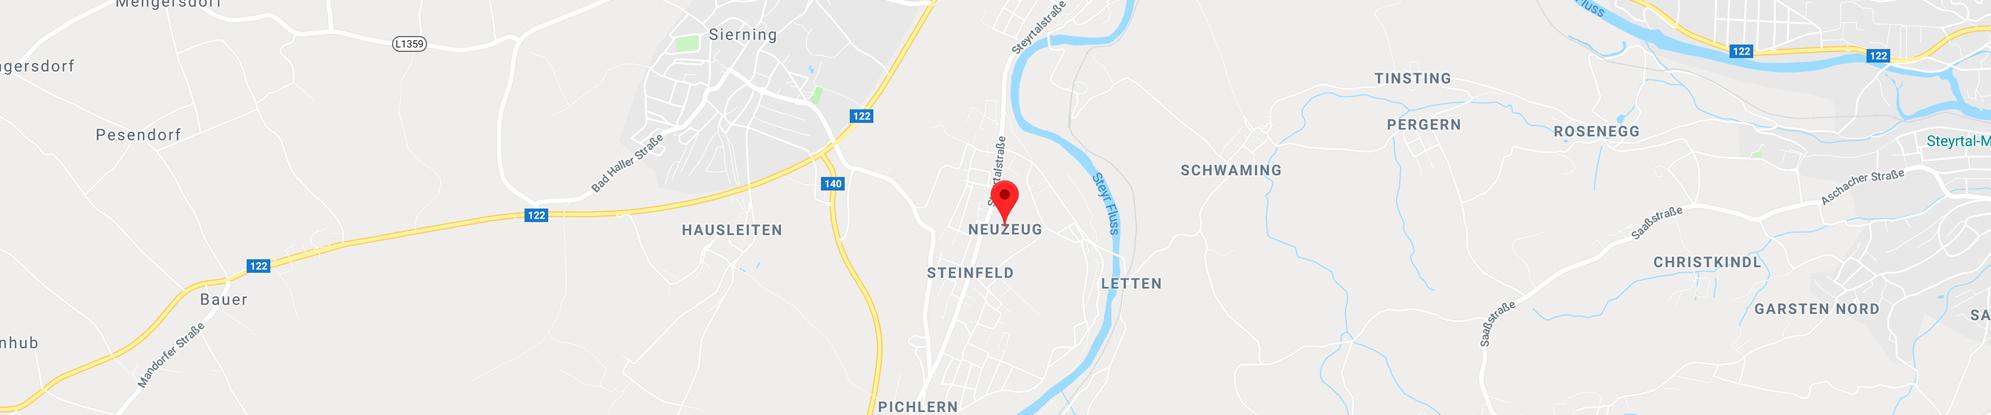 GL BEAUTY LASHES Wimpernverlängerung Lash Lifting Österreich